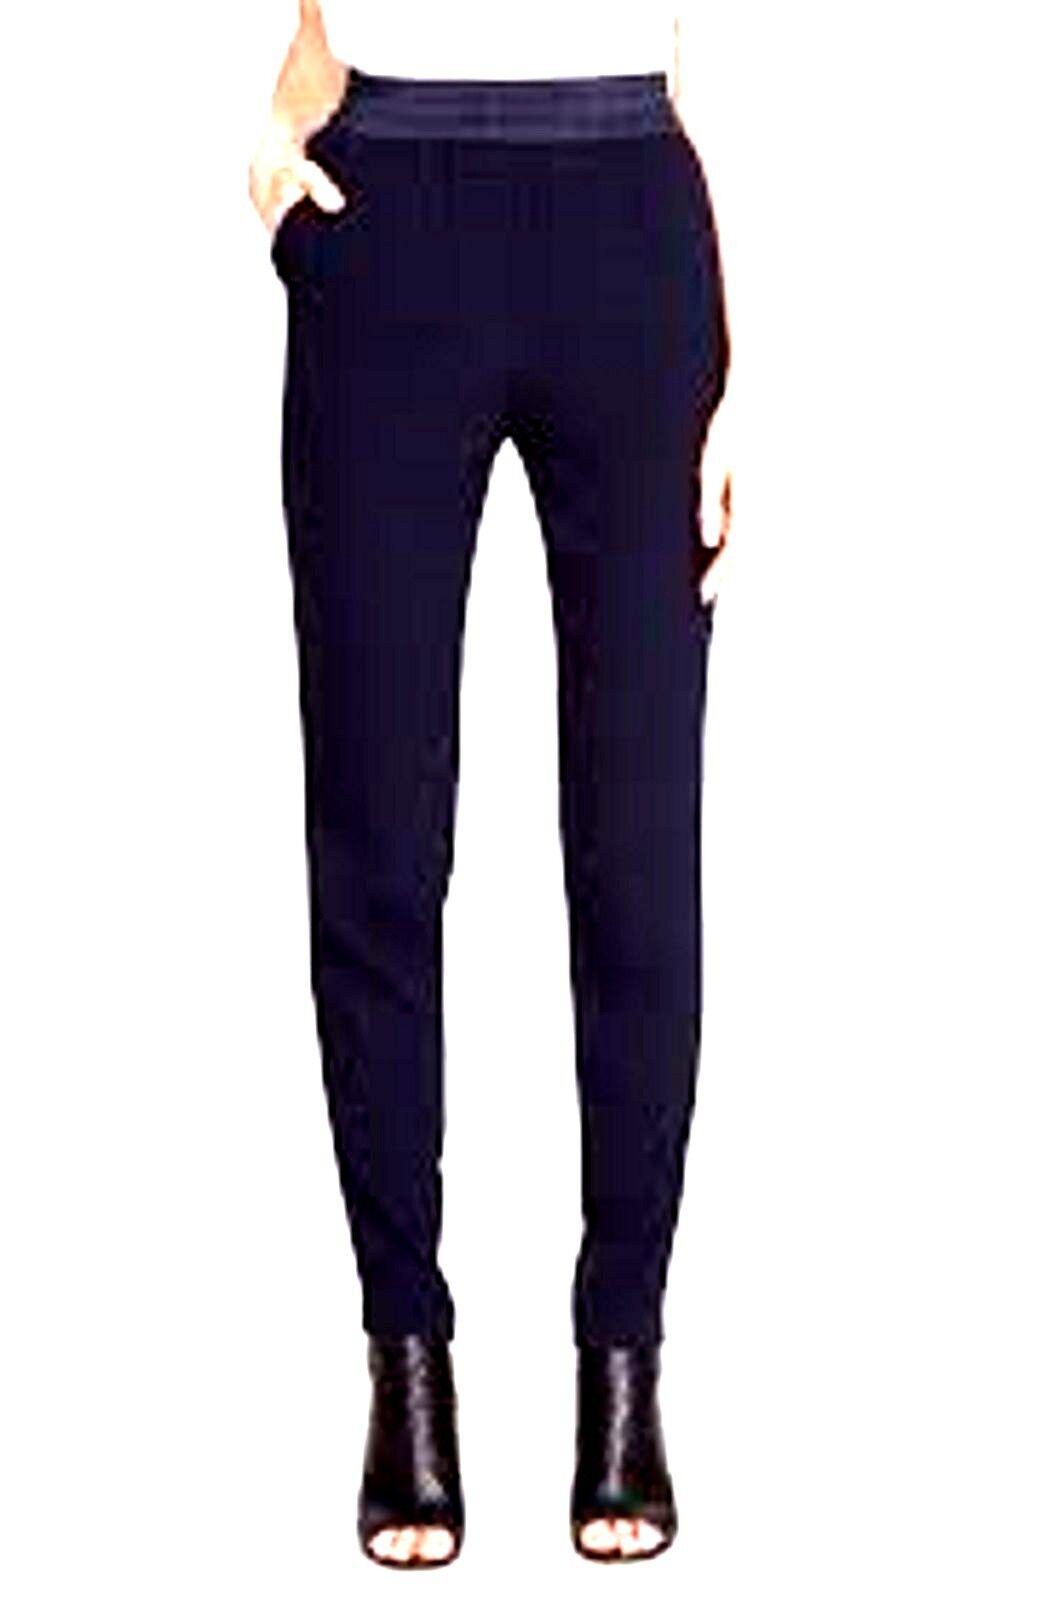 250 NWOT REBECCA TAYLOR  EMMA  NAVY blueE DRESS PANTS SIZE 4